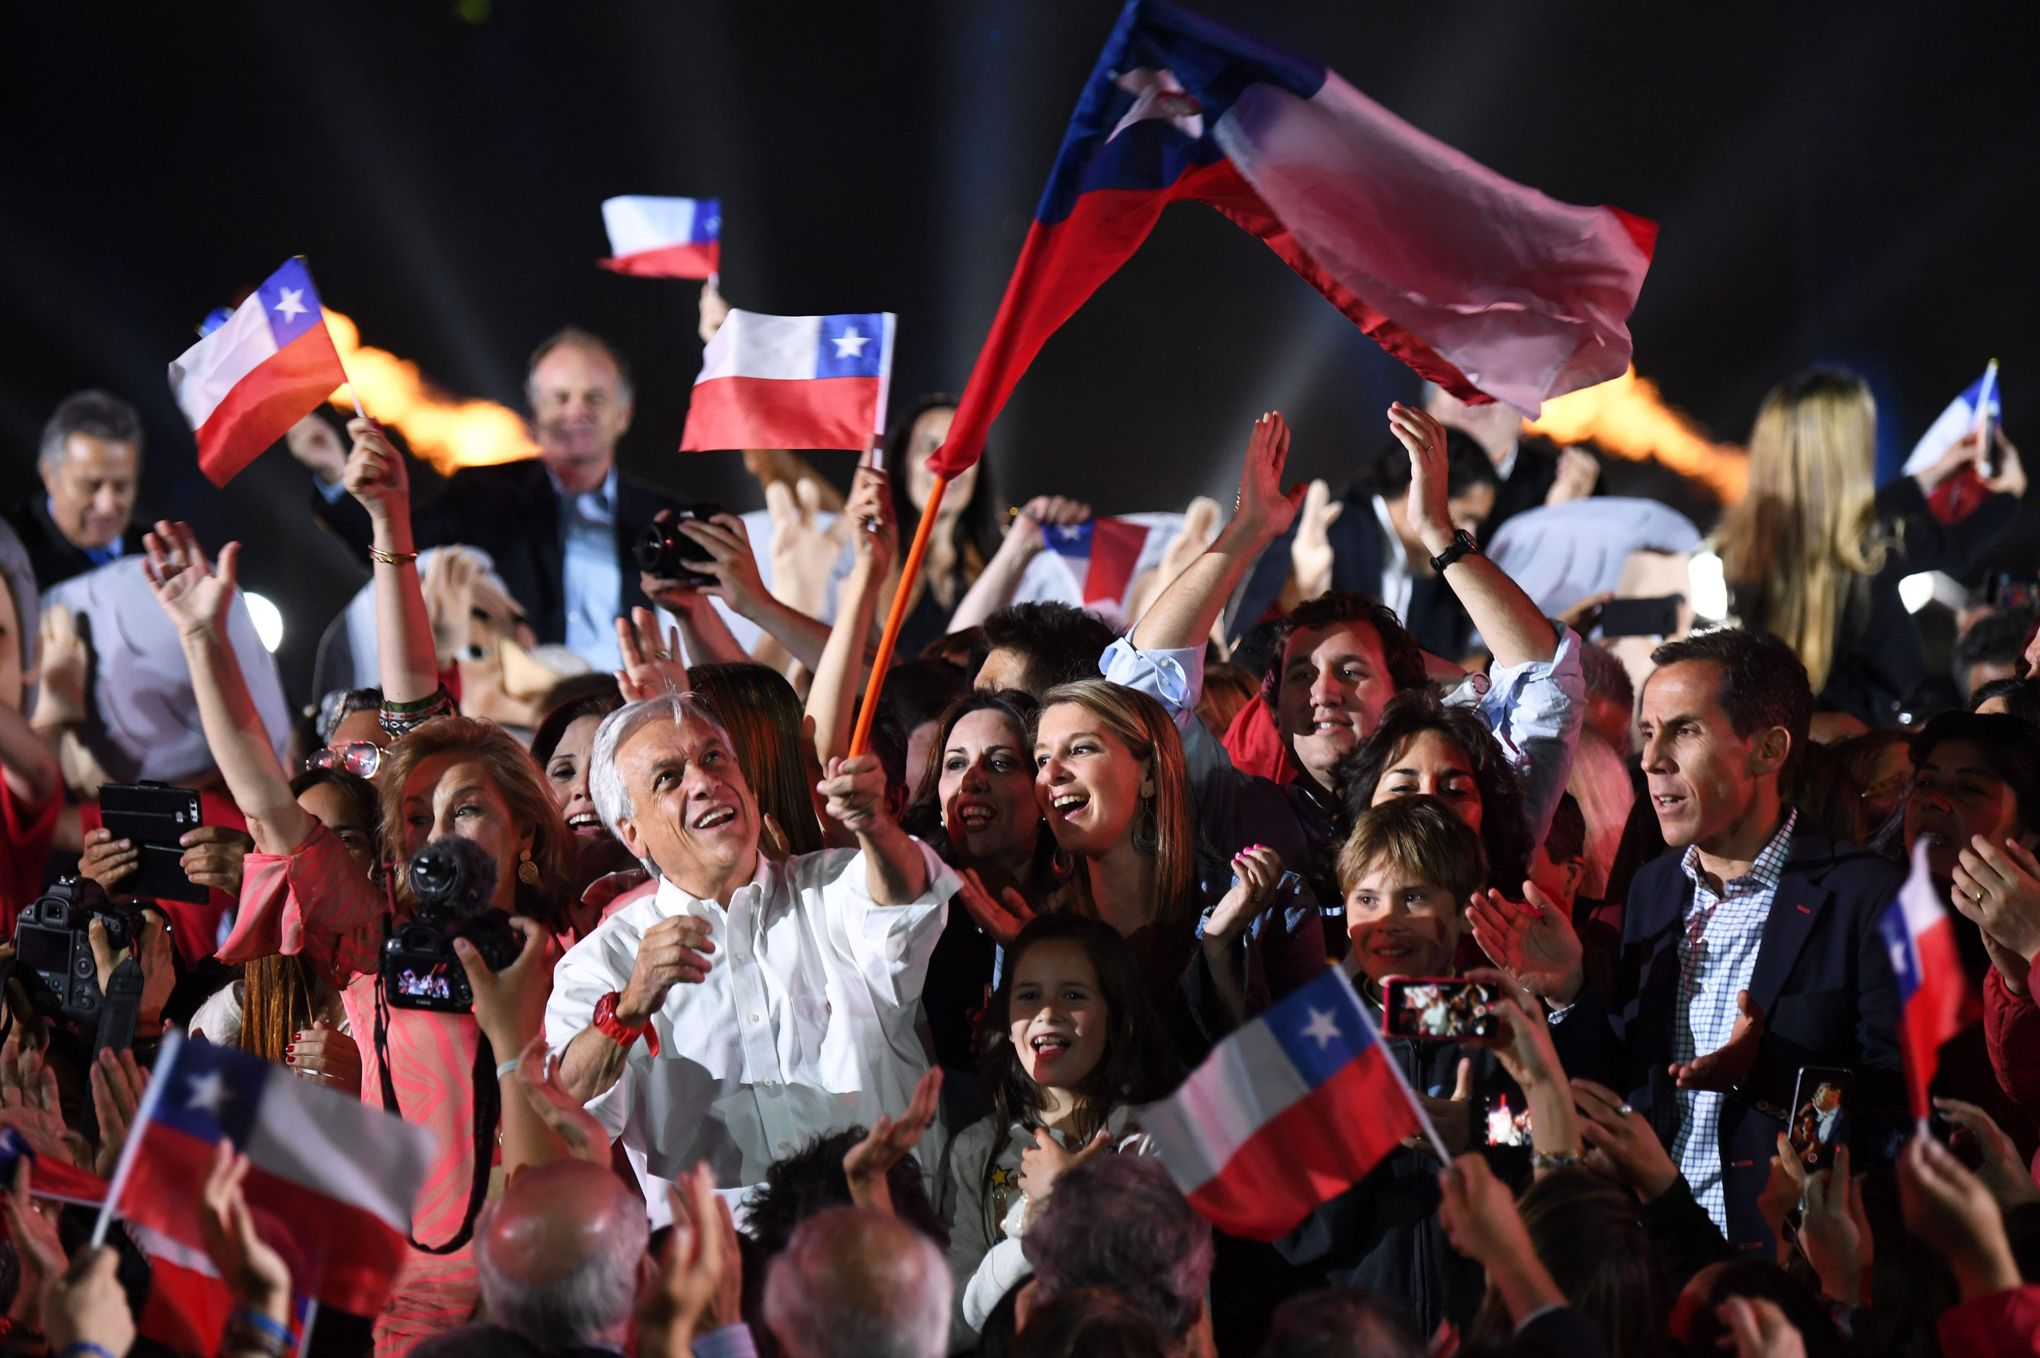 piñera élu président chili